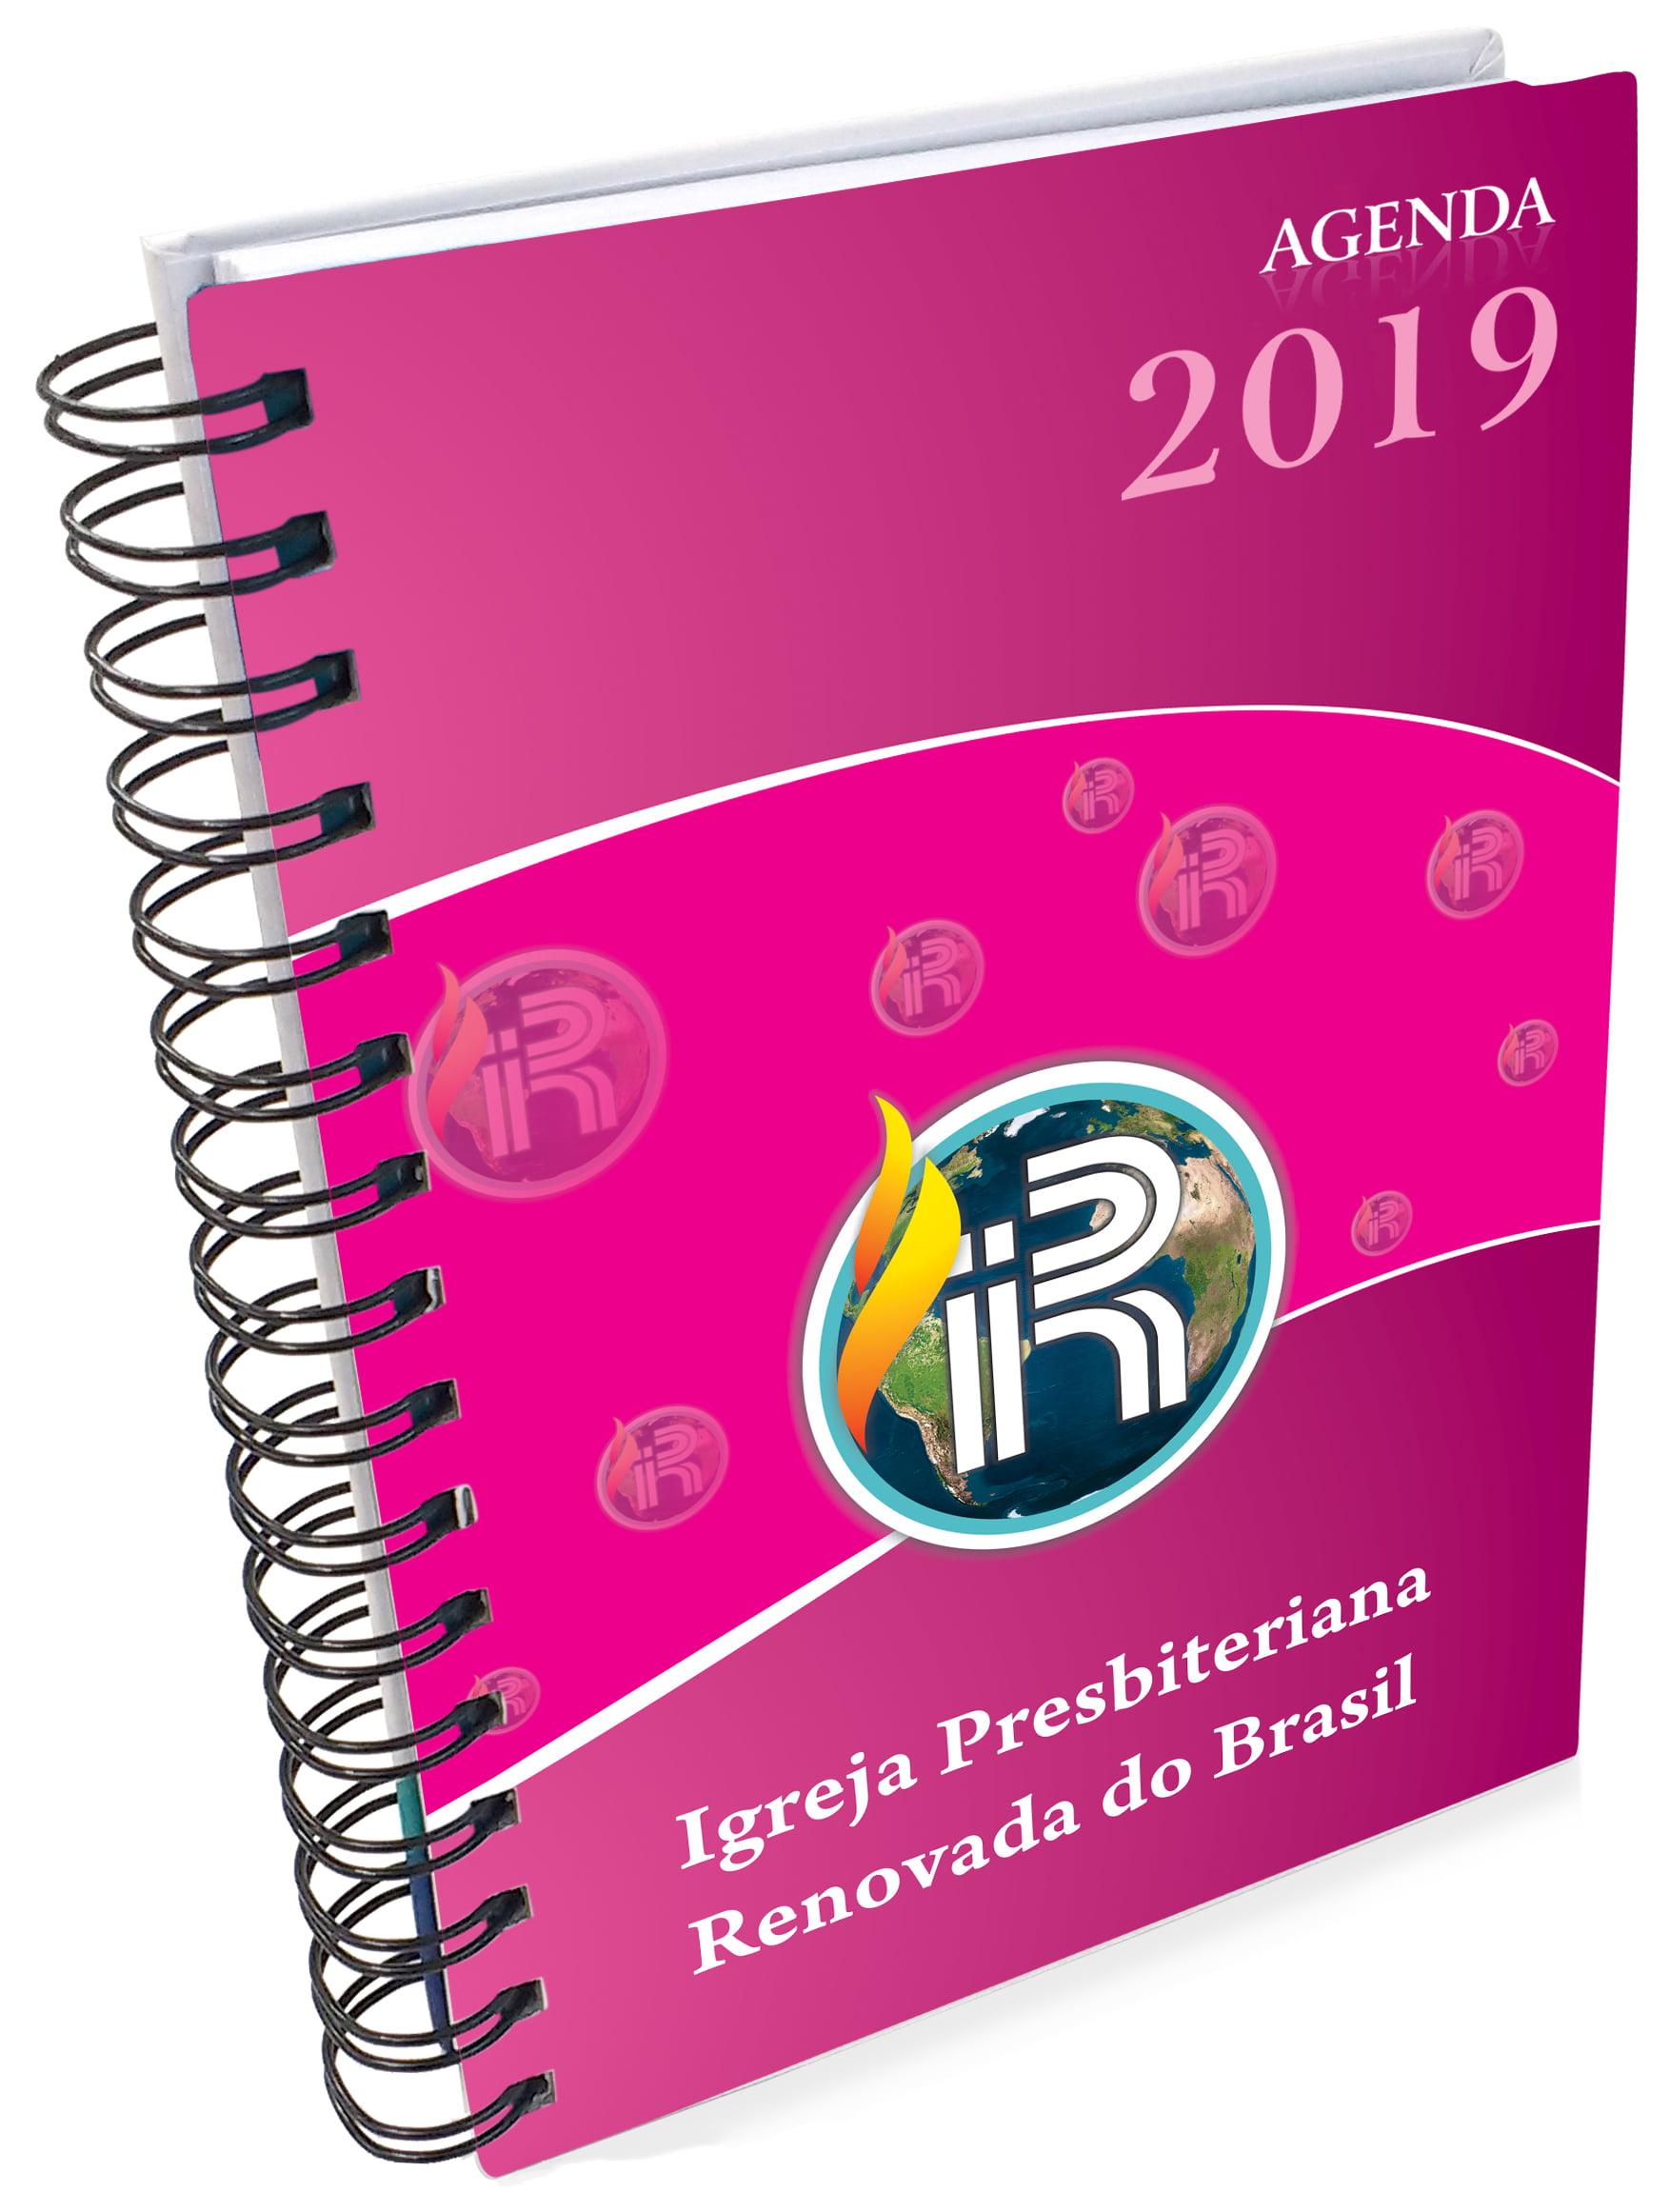 AGENDA DIÁRIA 2019 - IPRB   CAPA ROSA